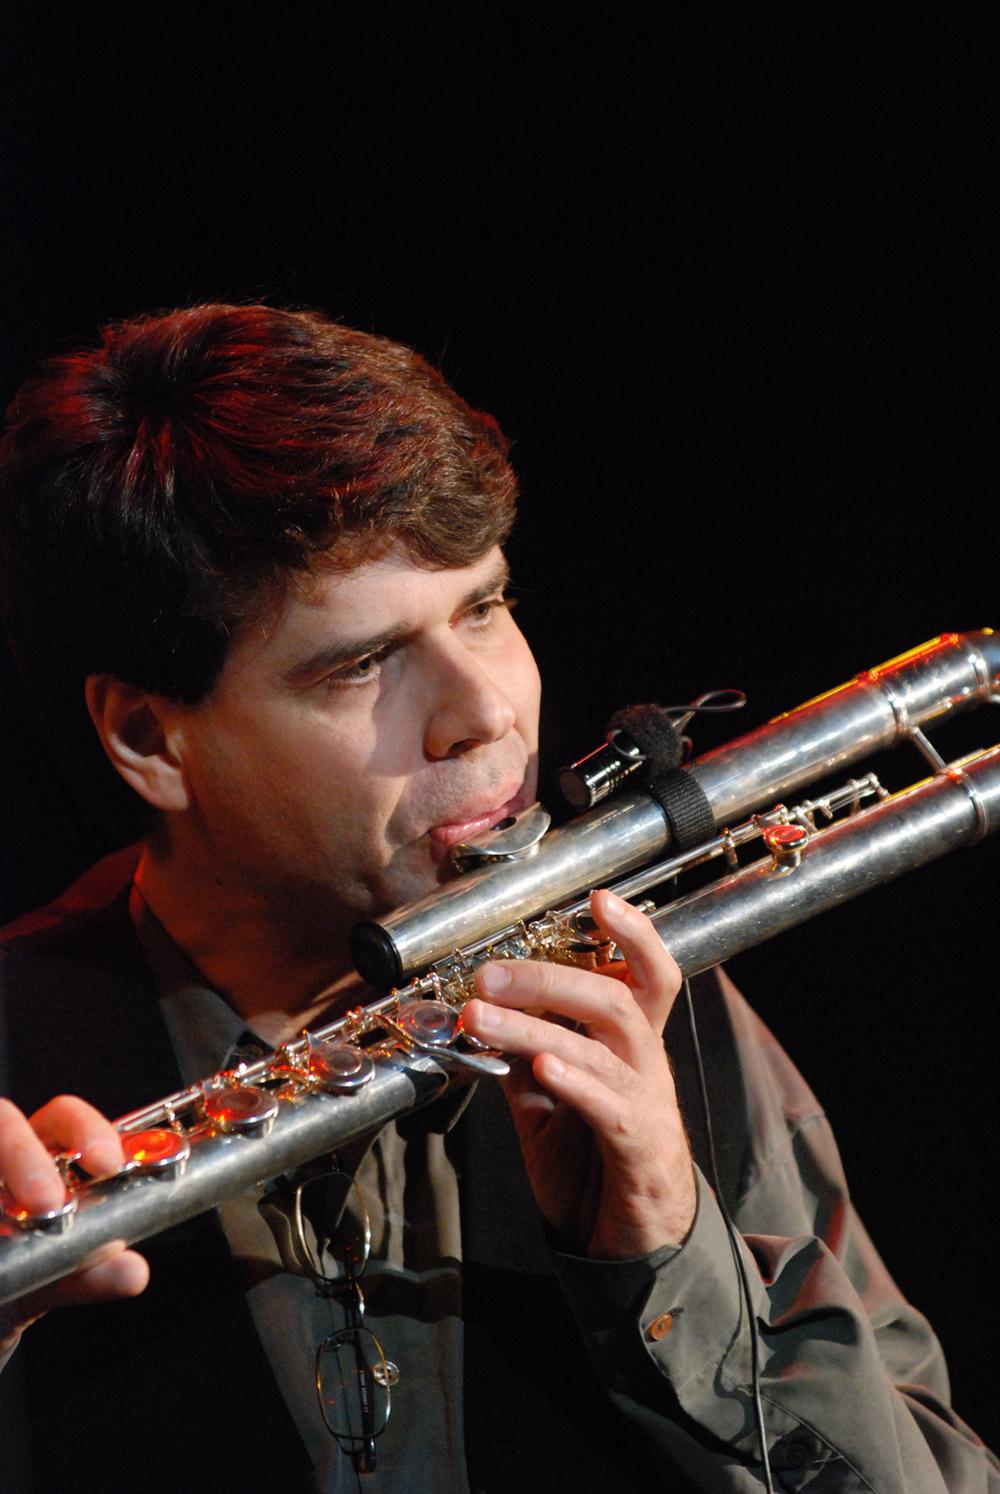 Mr. Brandão playing a bass flute.